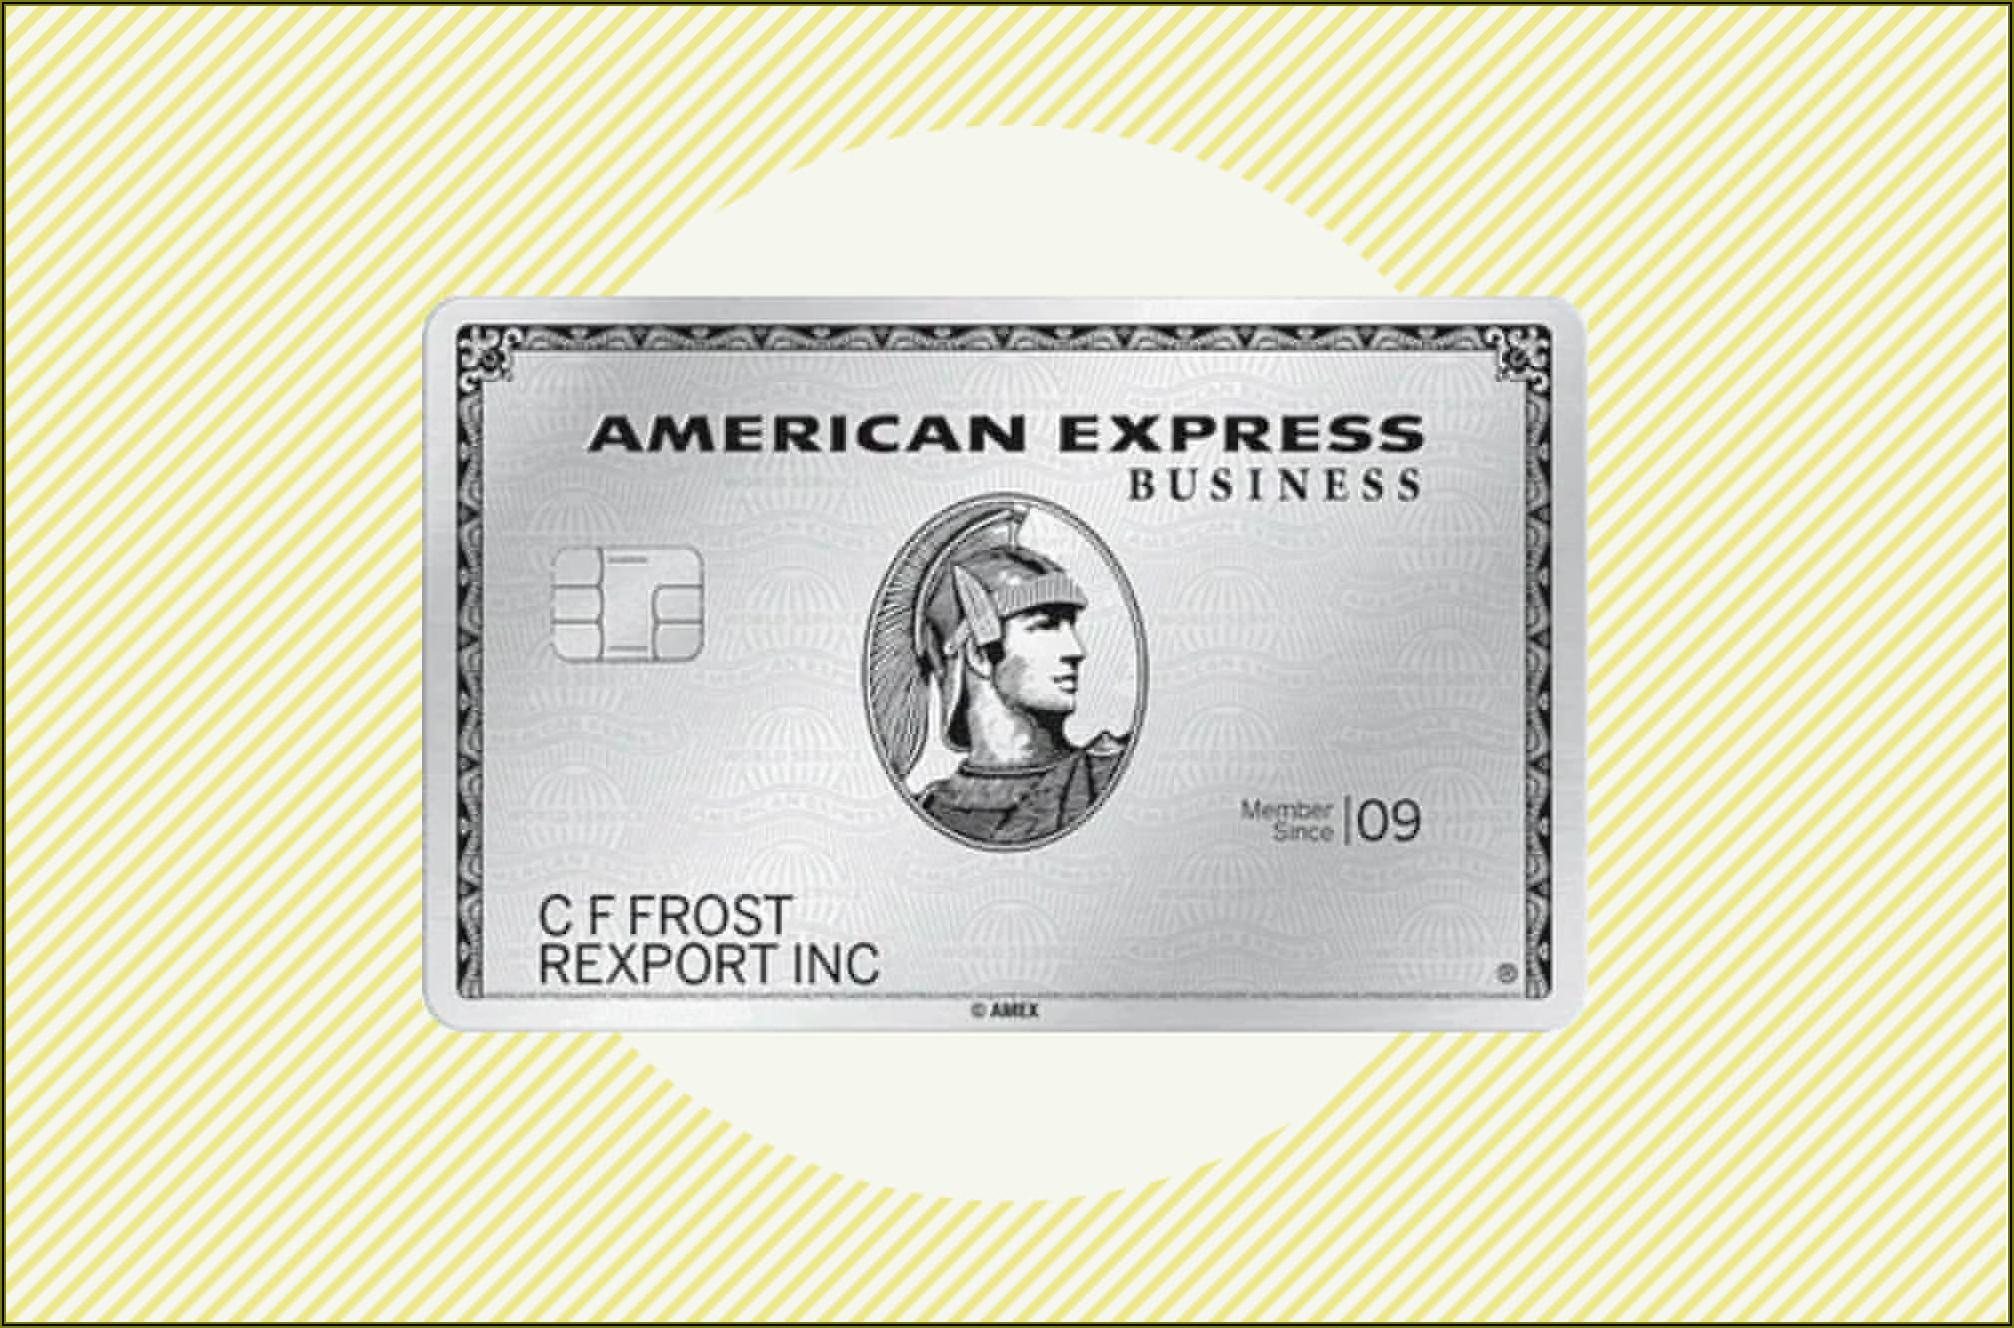 American Express Business Platinum Employee Card Benefits